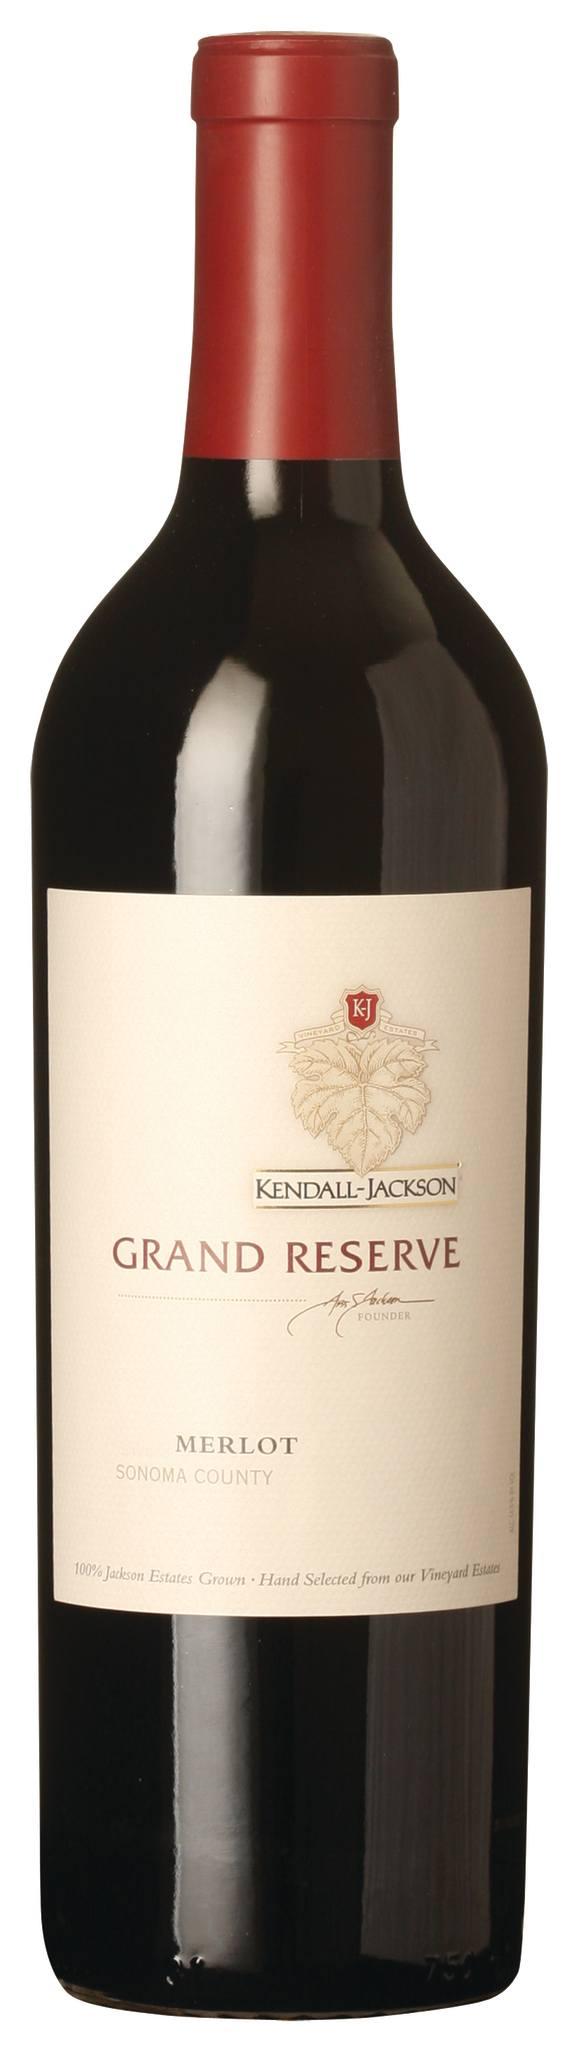 Kendall-Jackson Estates - Grand Reserve Merlot 2012